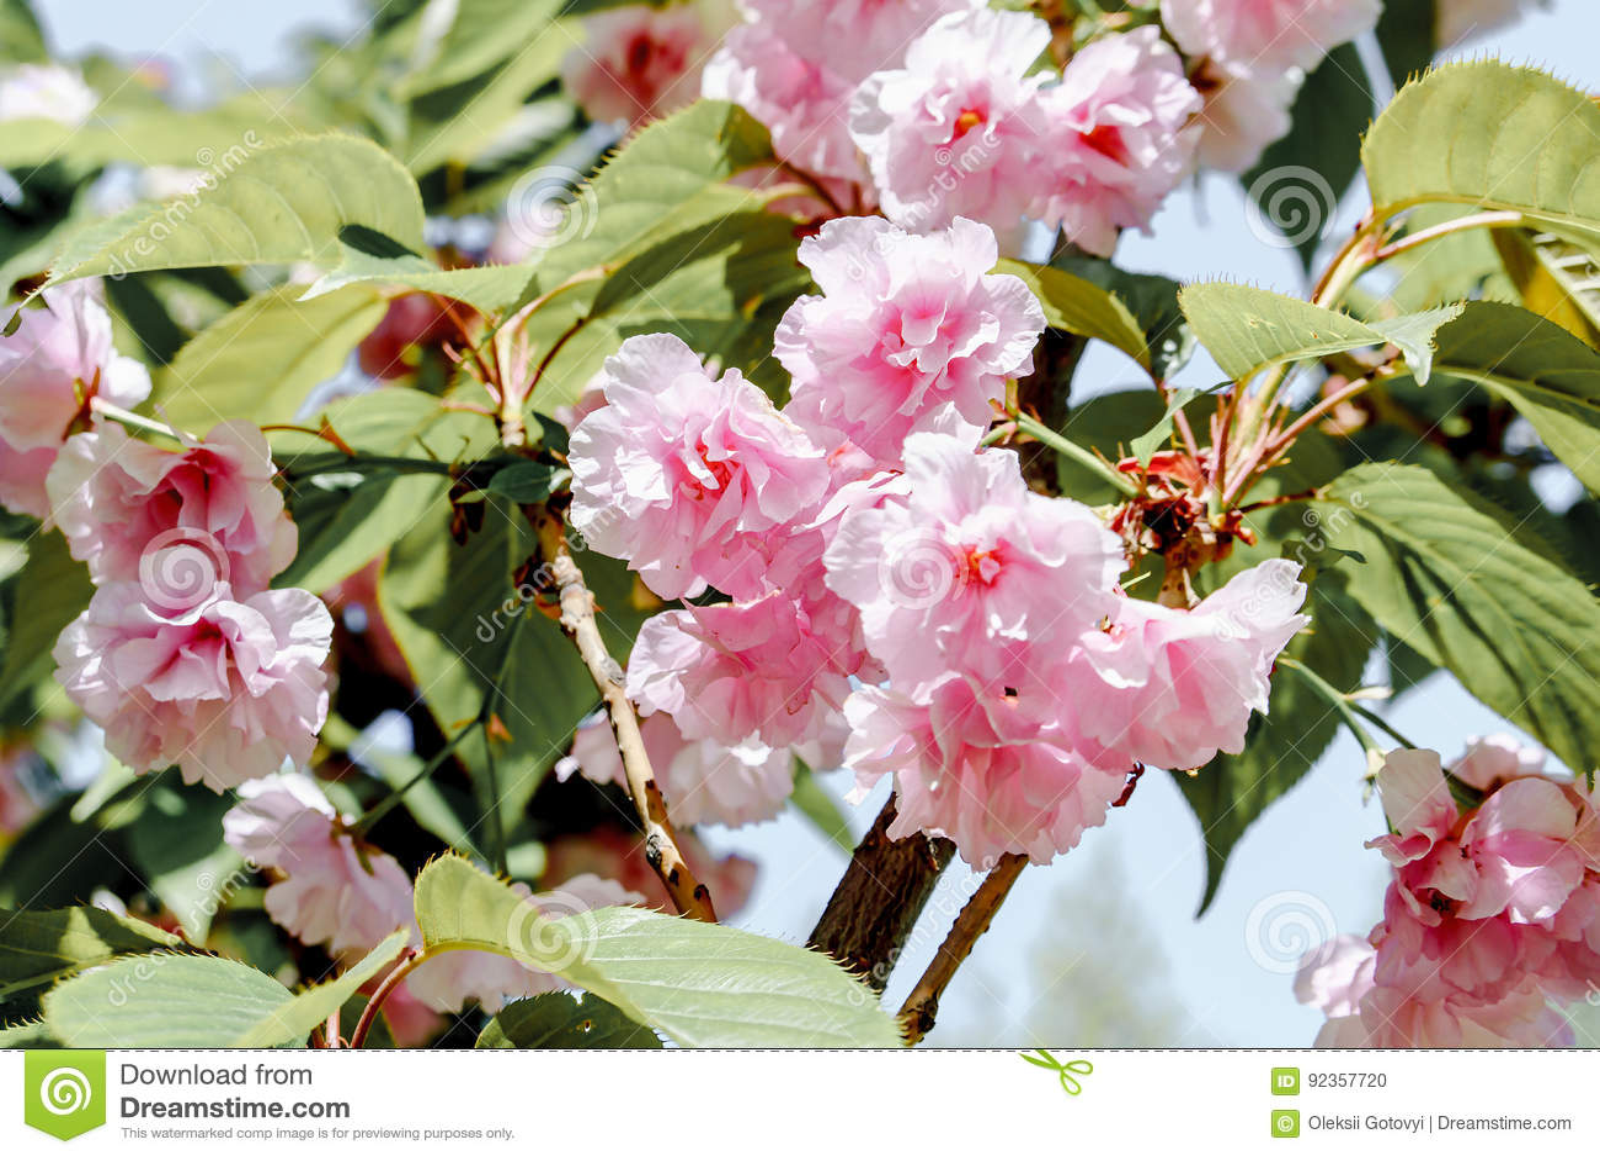 Beau Jardin Japonais De Fleur De Sakura En Avril Photo Stock Image